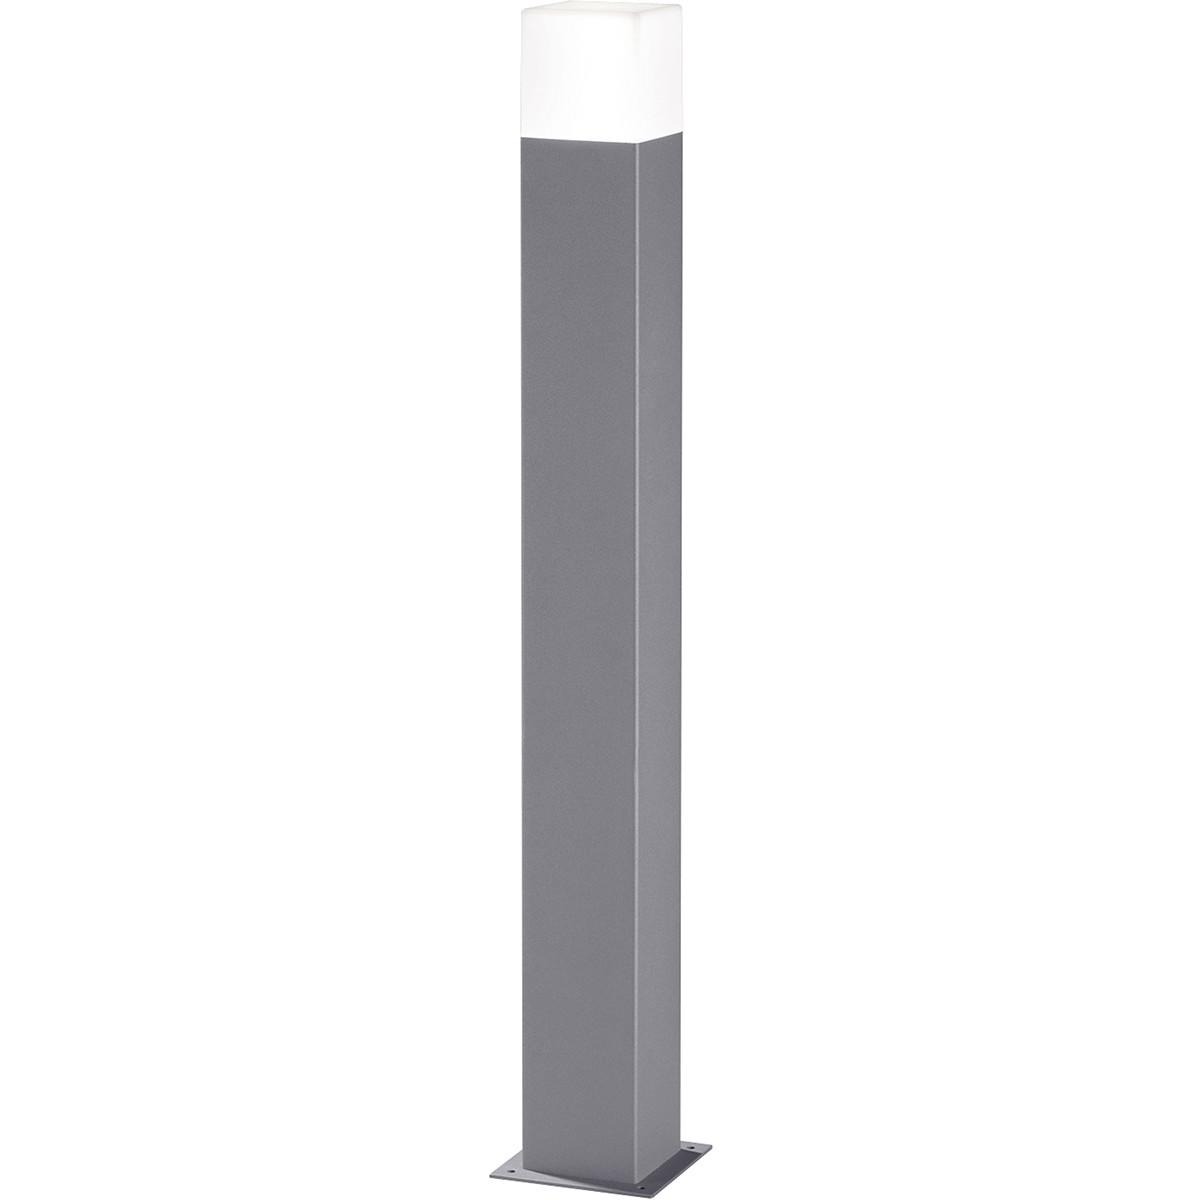 LED Tuinverlichting - Buitenlamp - Trion Hudsy XL - Staand - 4W - Mat Titaan - Aluminium